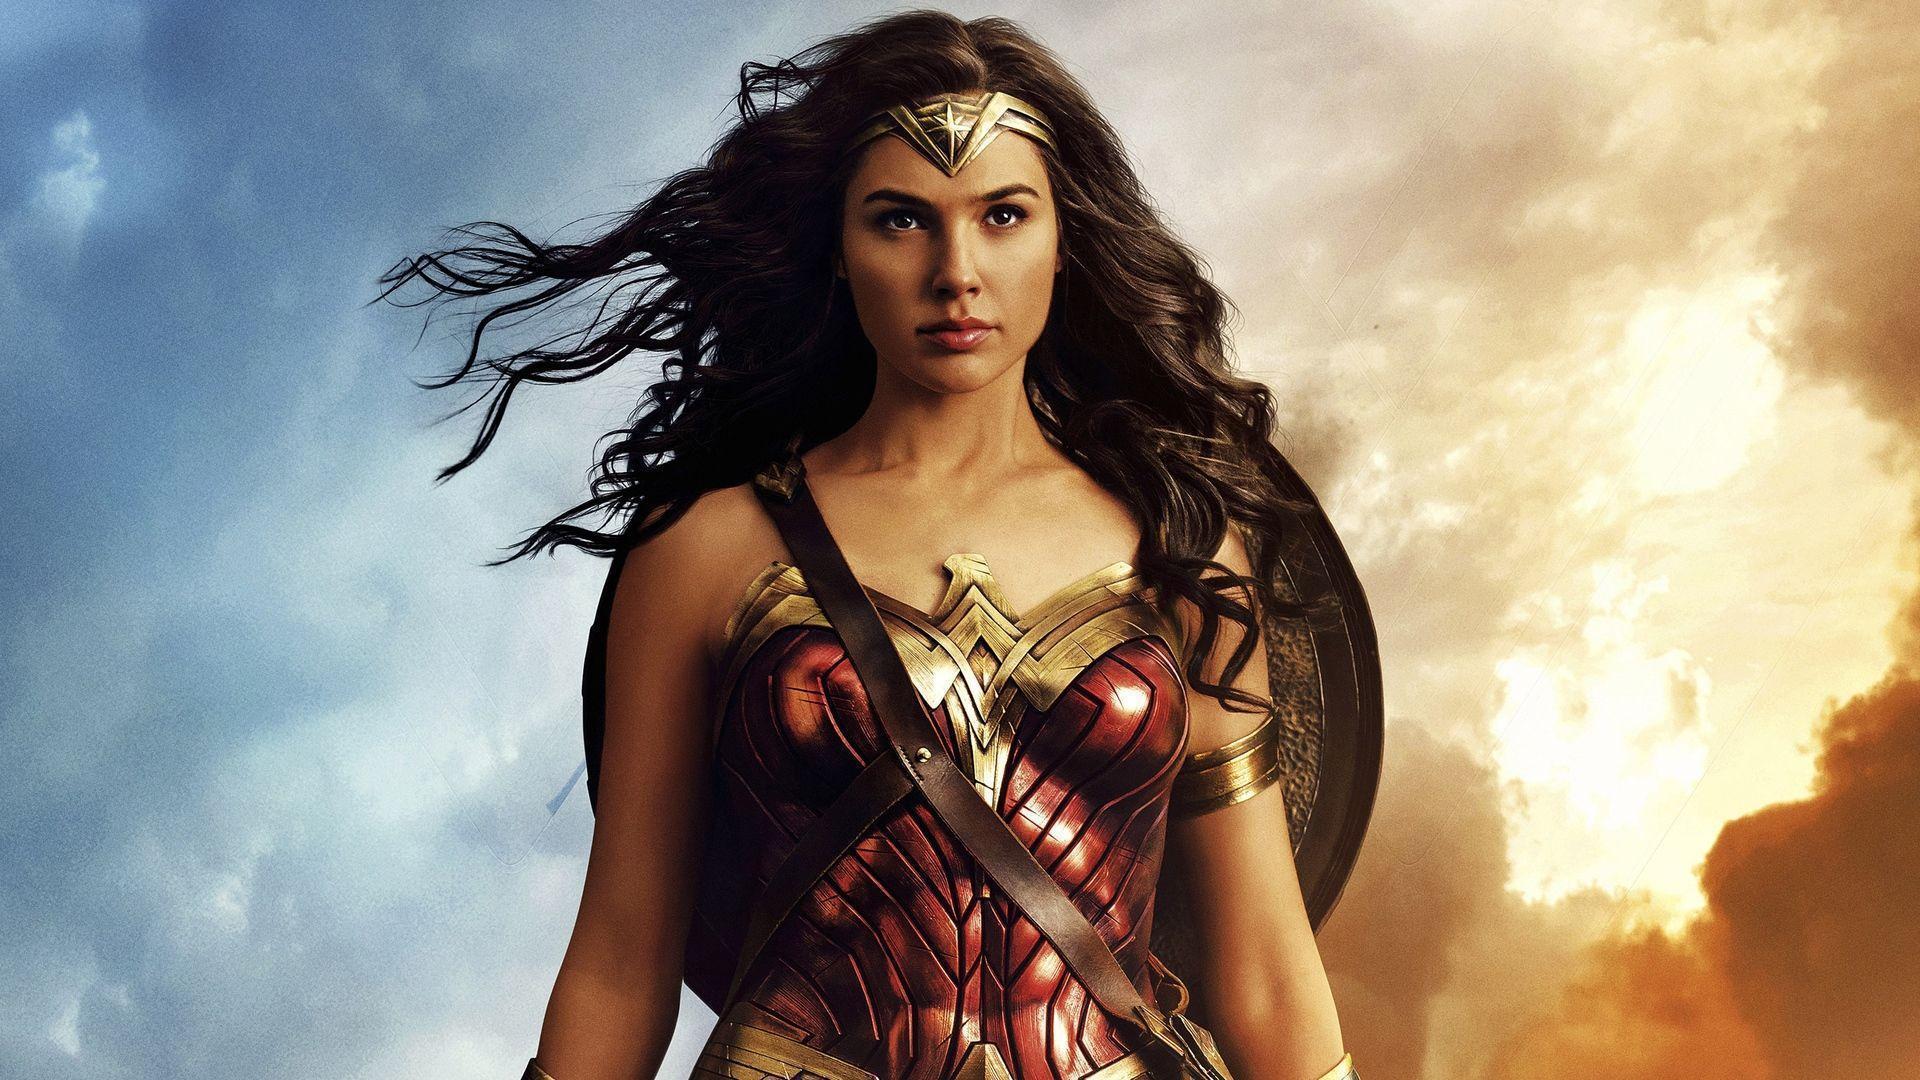 Wallpaper Wonder Woman Gal Gadot Hd 4k 2017 Movies 2361: Gal Gadot 2017 Wallpapers